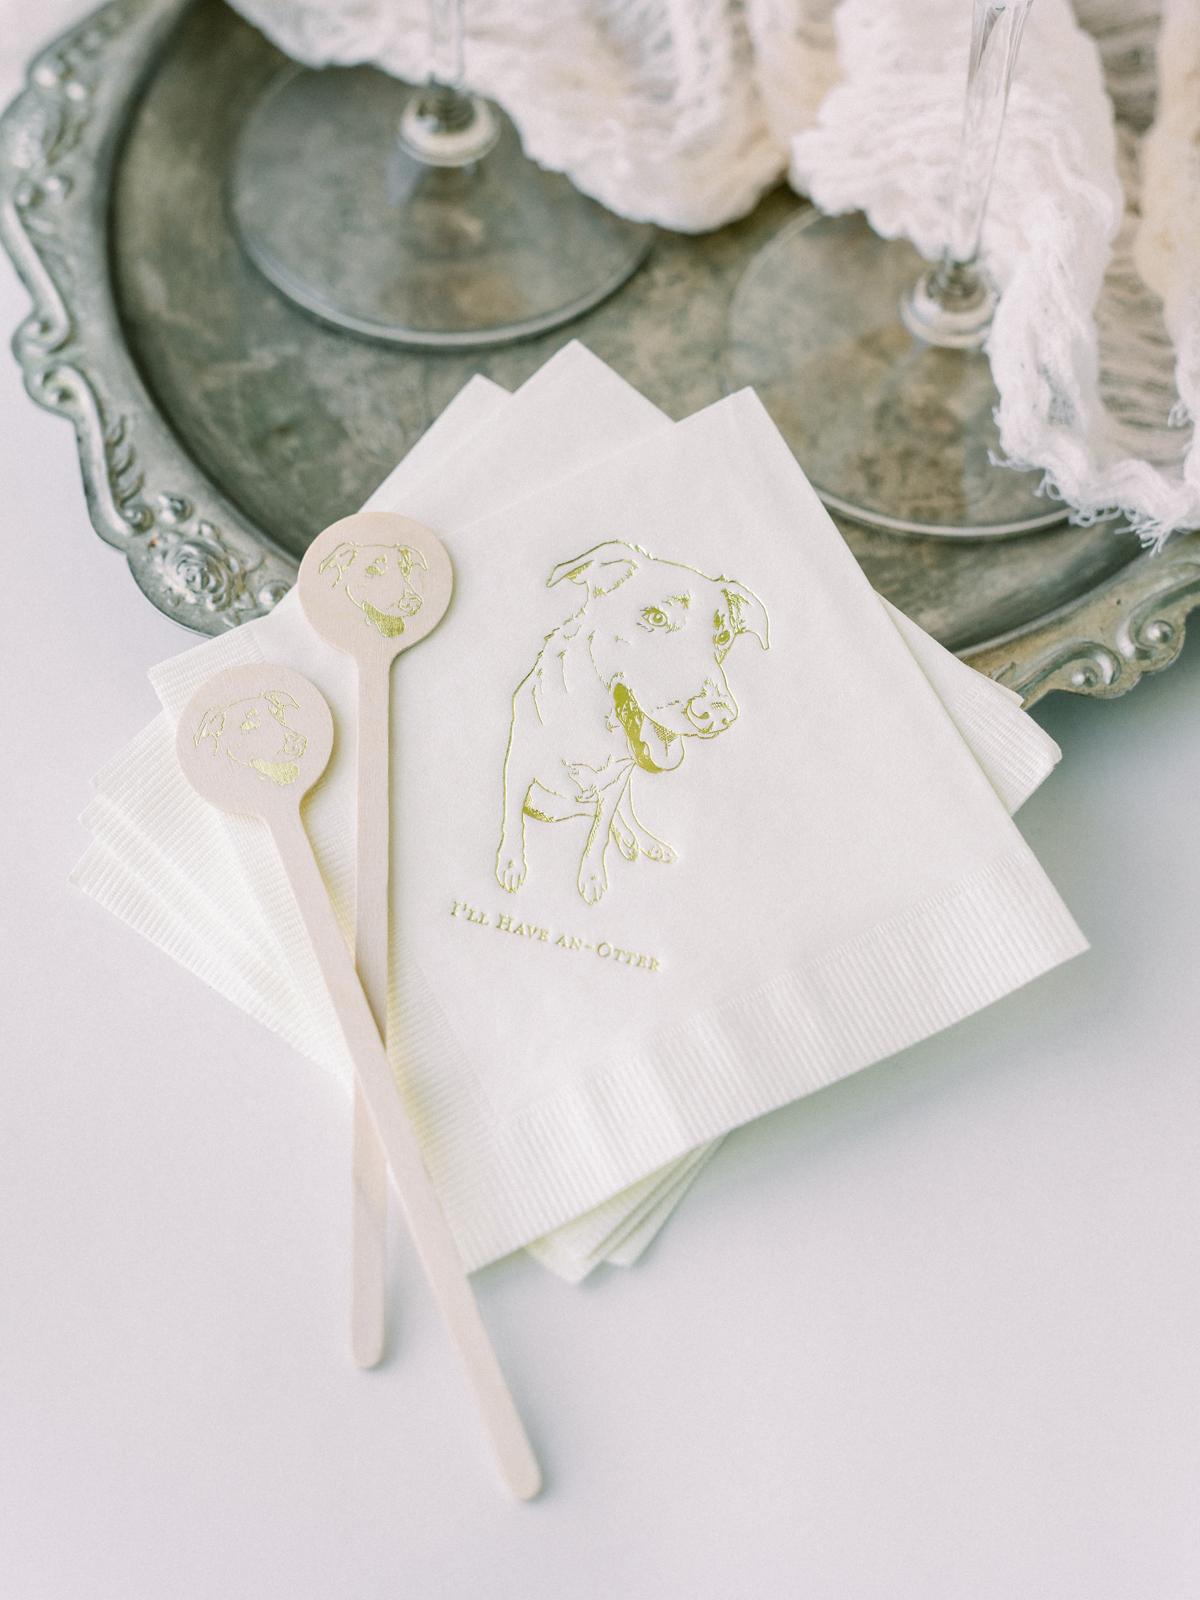 saghar ben wedding stirrers and napkins